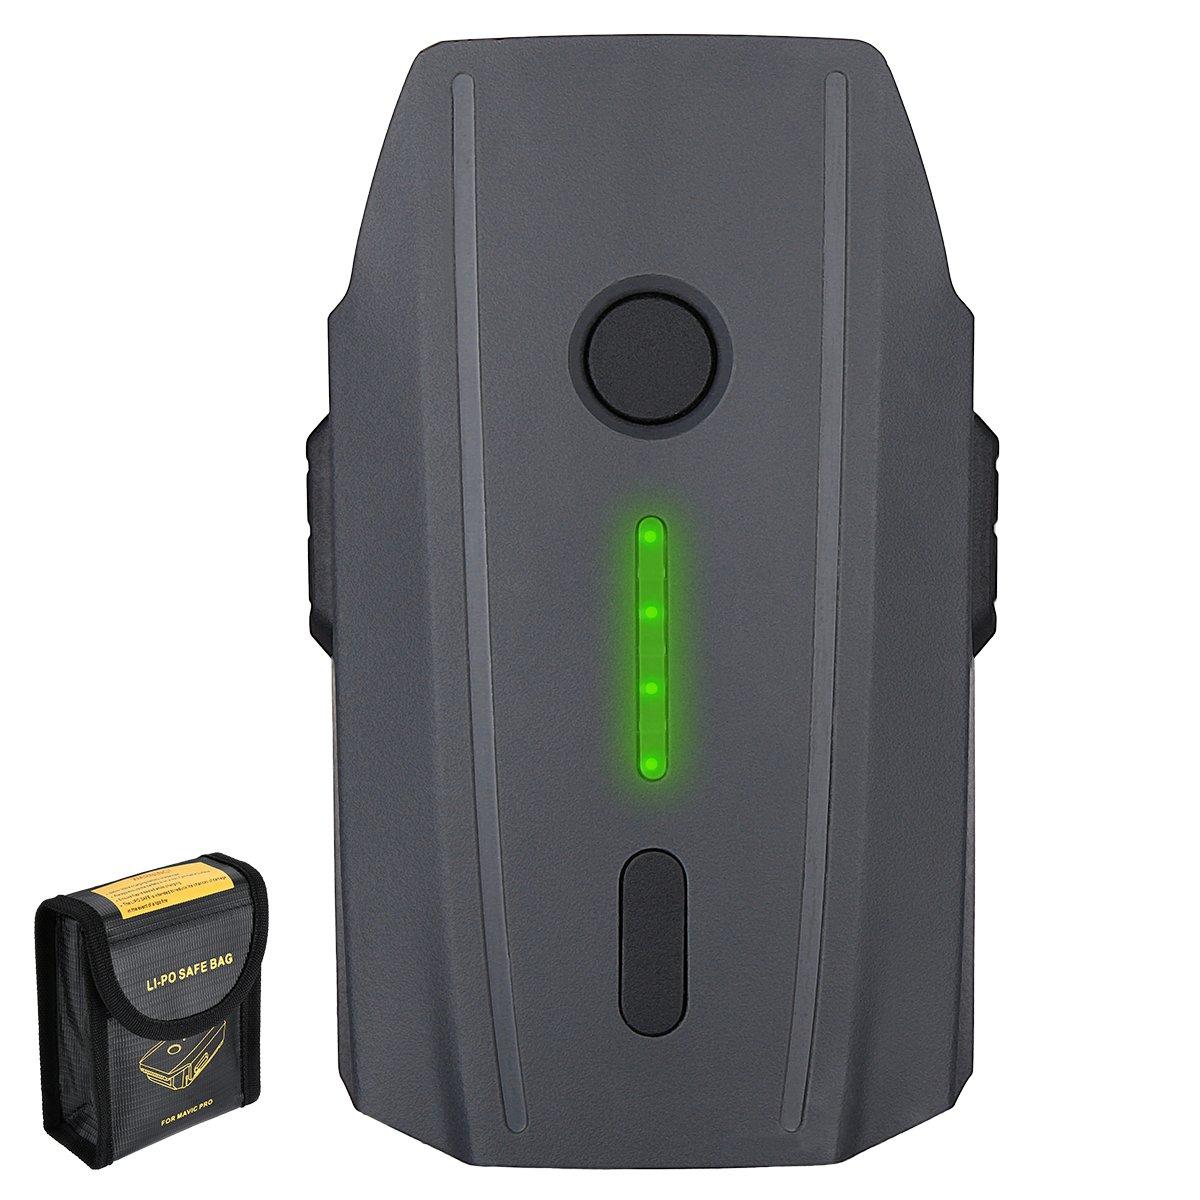 1 Pack Mavic Pro Battery Mavic Pro Battery, Powerextra 11.4V 3830mAh LiPo Intelligent Flight Battery Replacement with Battery Safe Bag for DJI Mavic Pro Drones